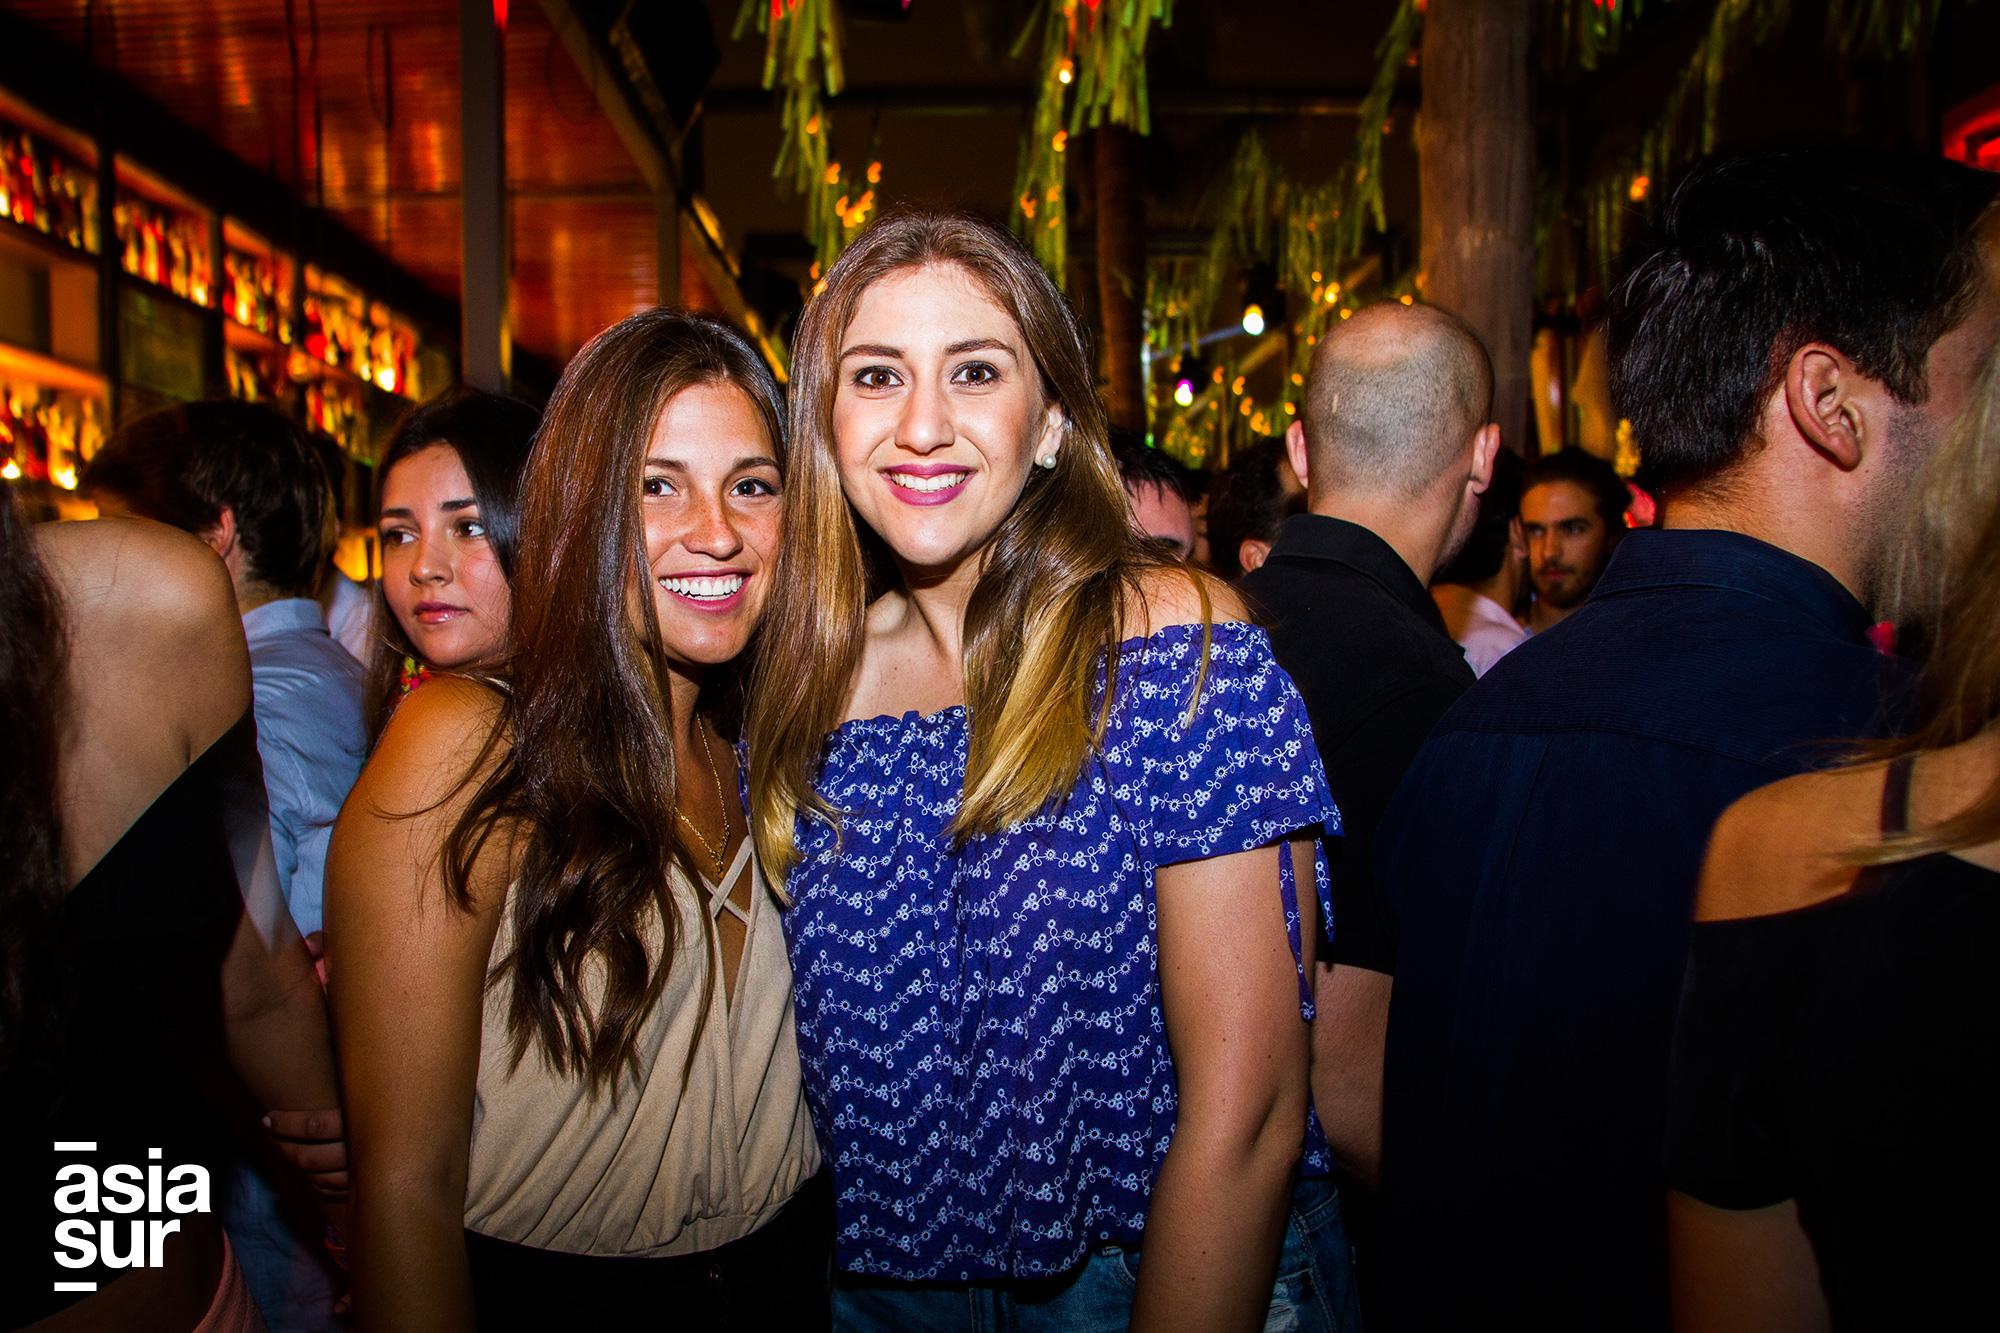 Luciana Cassinelli y Maria Gracia Espinoza en Café del Mar